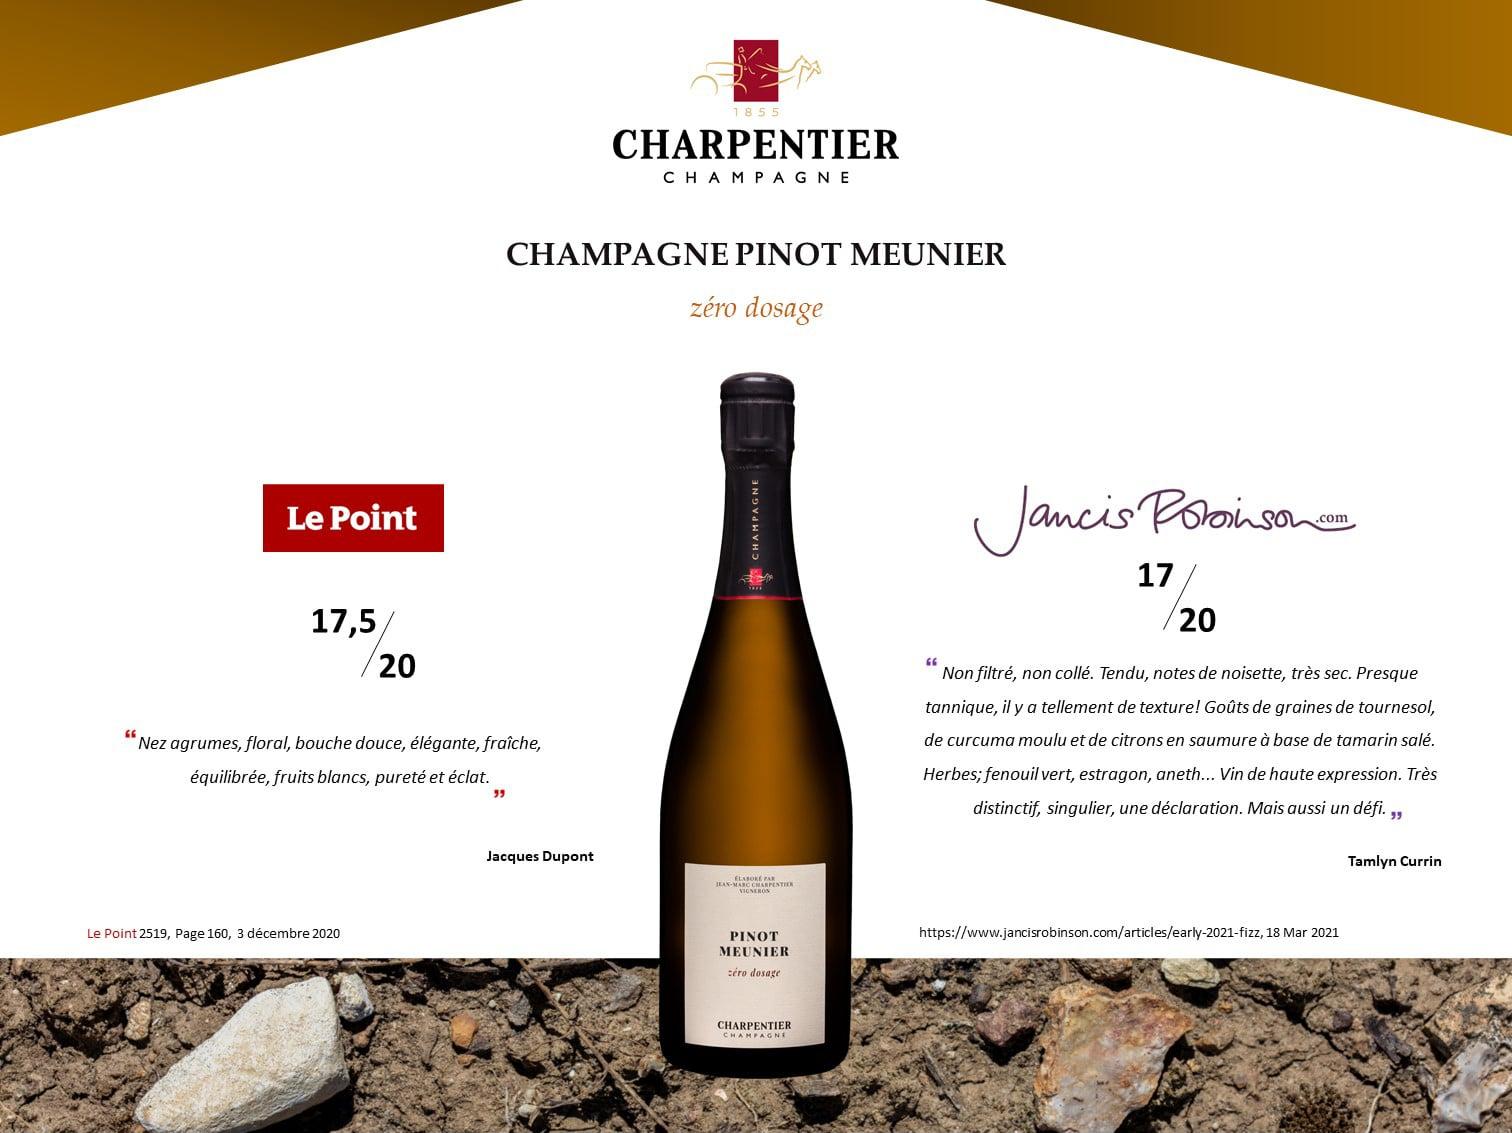 Champagne-CHARPENTIER-Charly-Sur-Marne-Pinot-Meunier-zero-dosage-Articles-presse-J.-Dupont-et-J.-Robinson